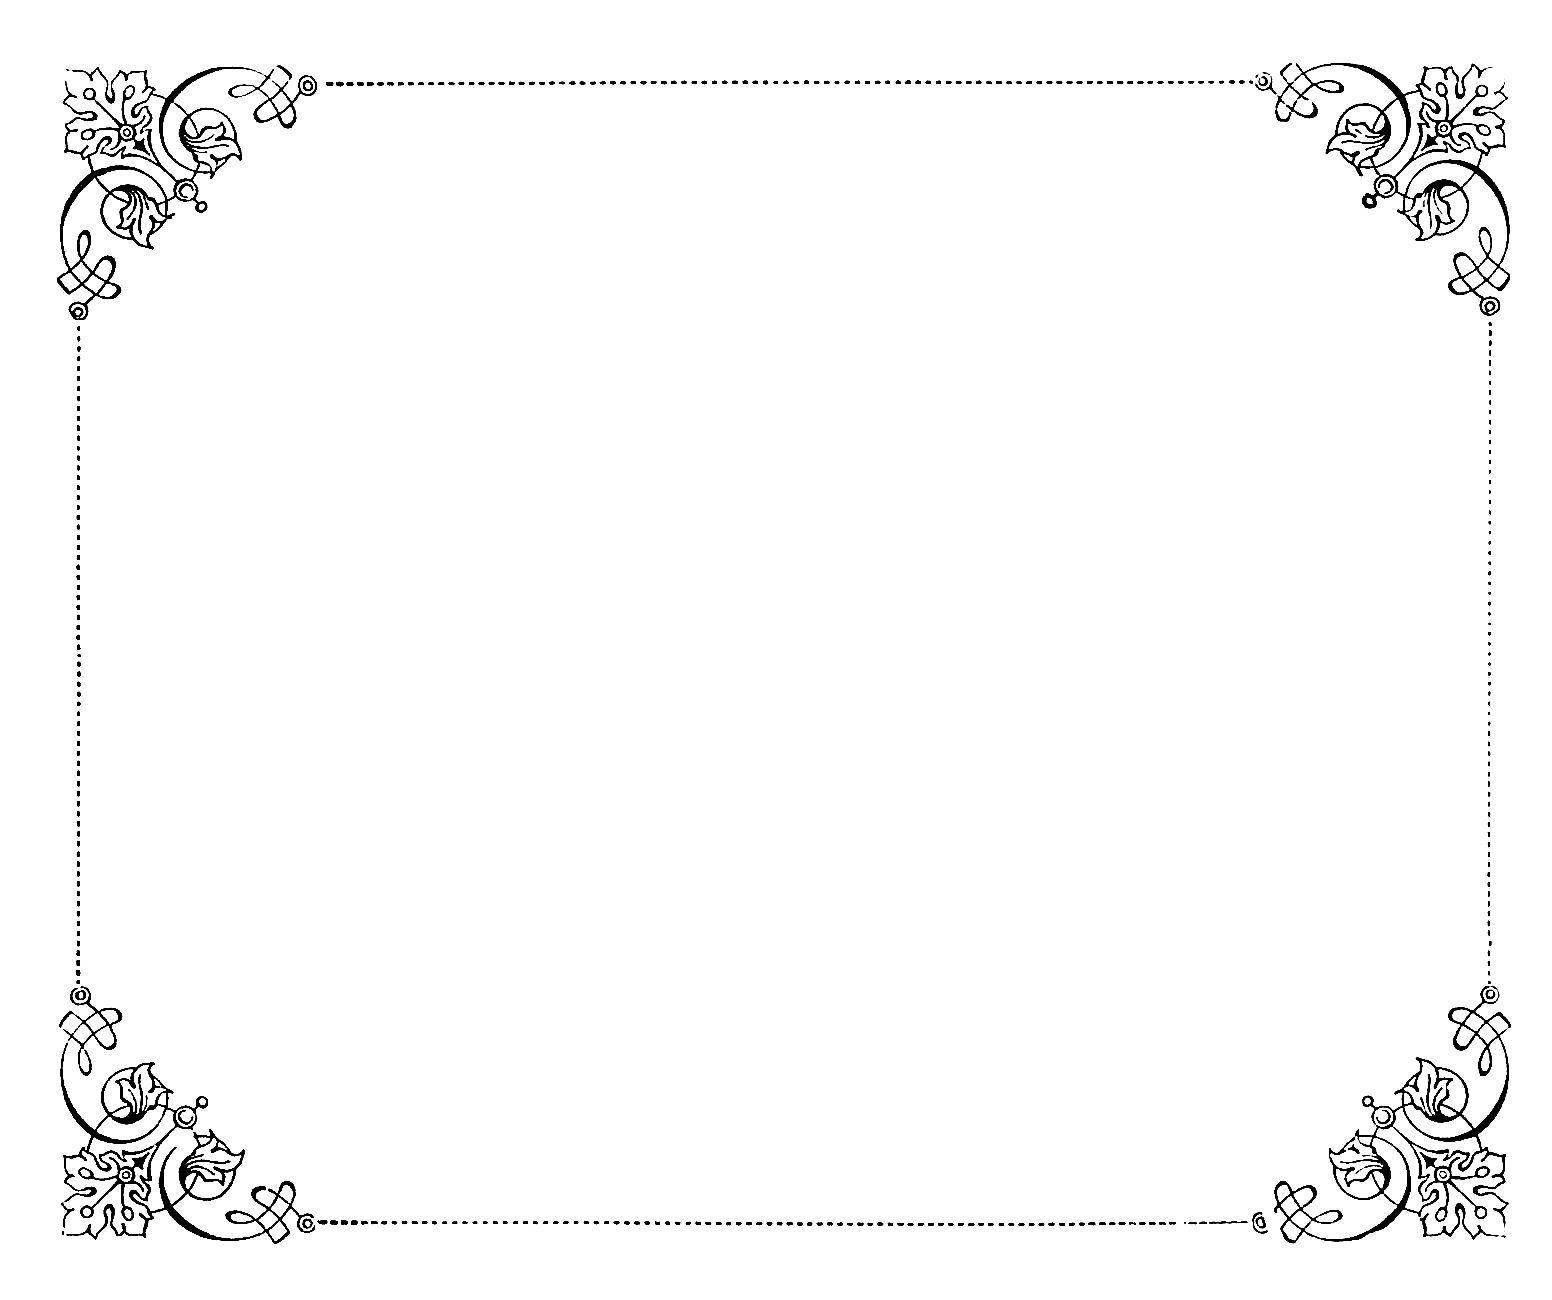 Digital Stamp Design Free Frame Digital Stamp Antique Square Frame Design With Decorative Corners Desain Banner Ornamen Bingkai